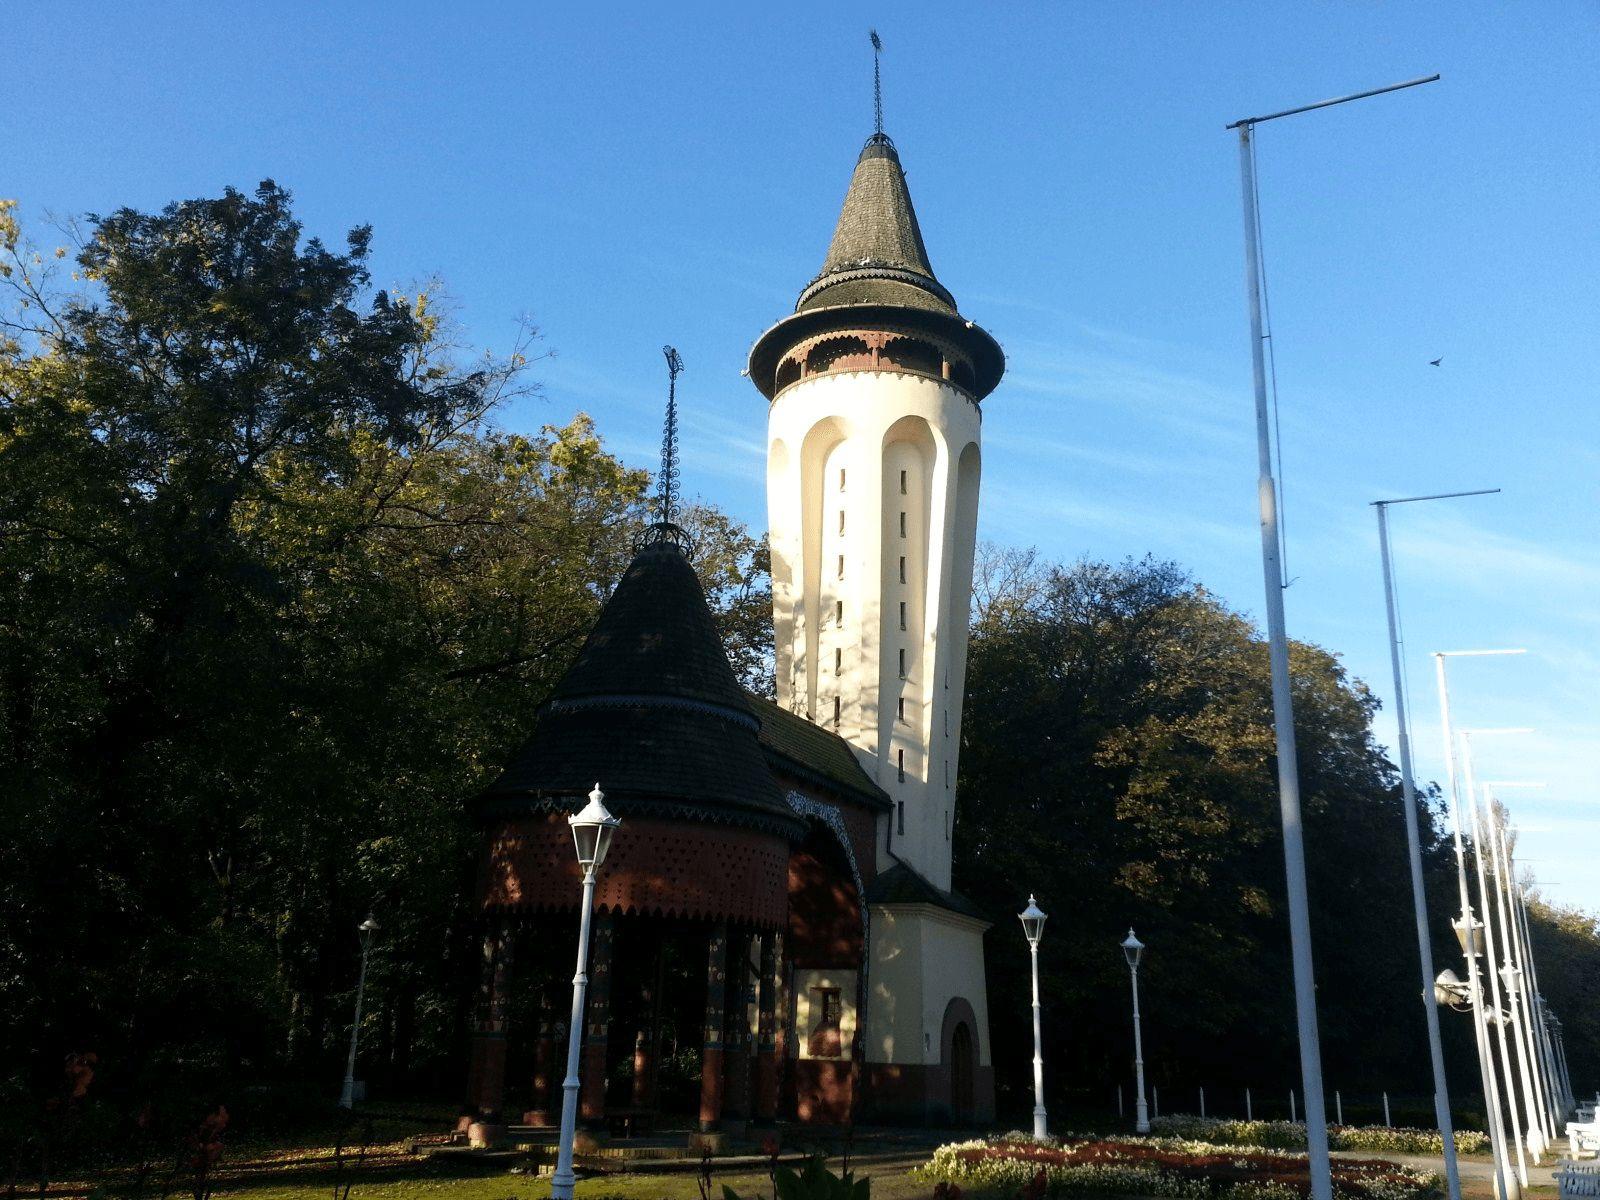 Beograd i Vojvodina: Palić: secesijski vodotoranj